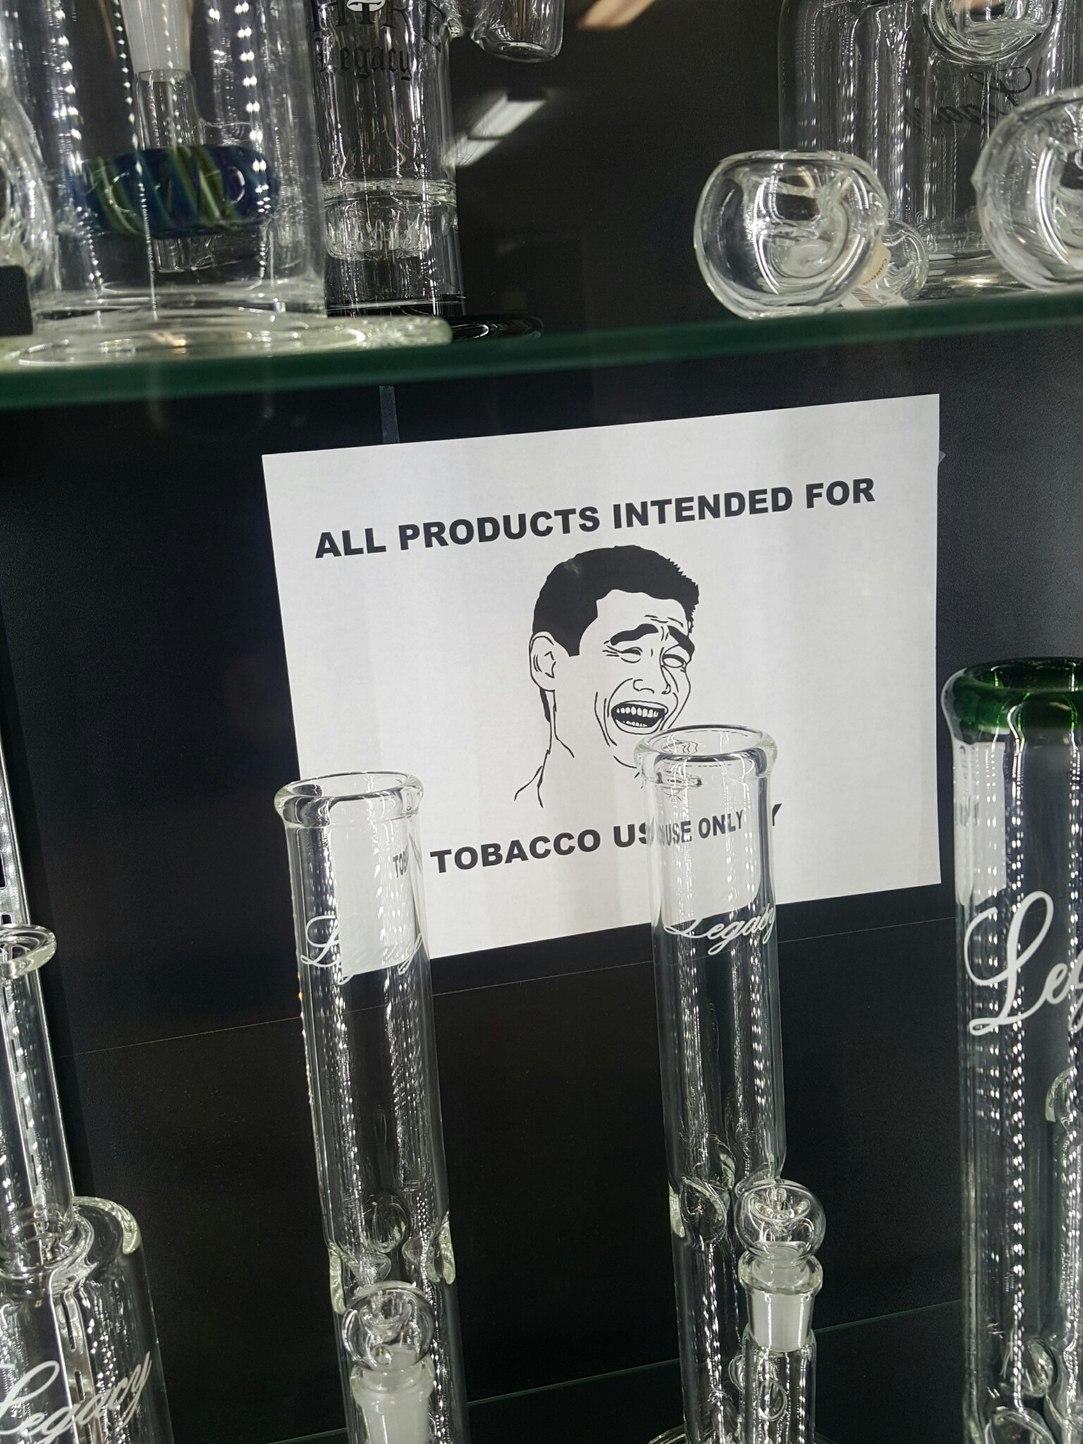 What I saw at my local smoke shop. - meme